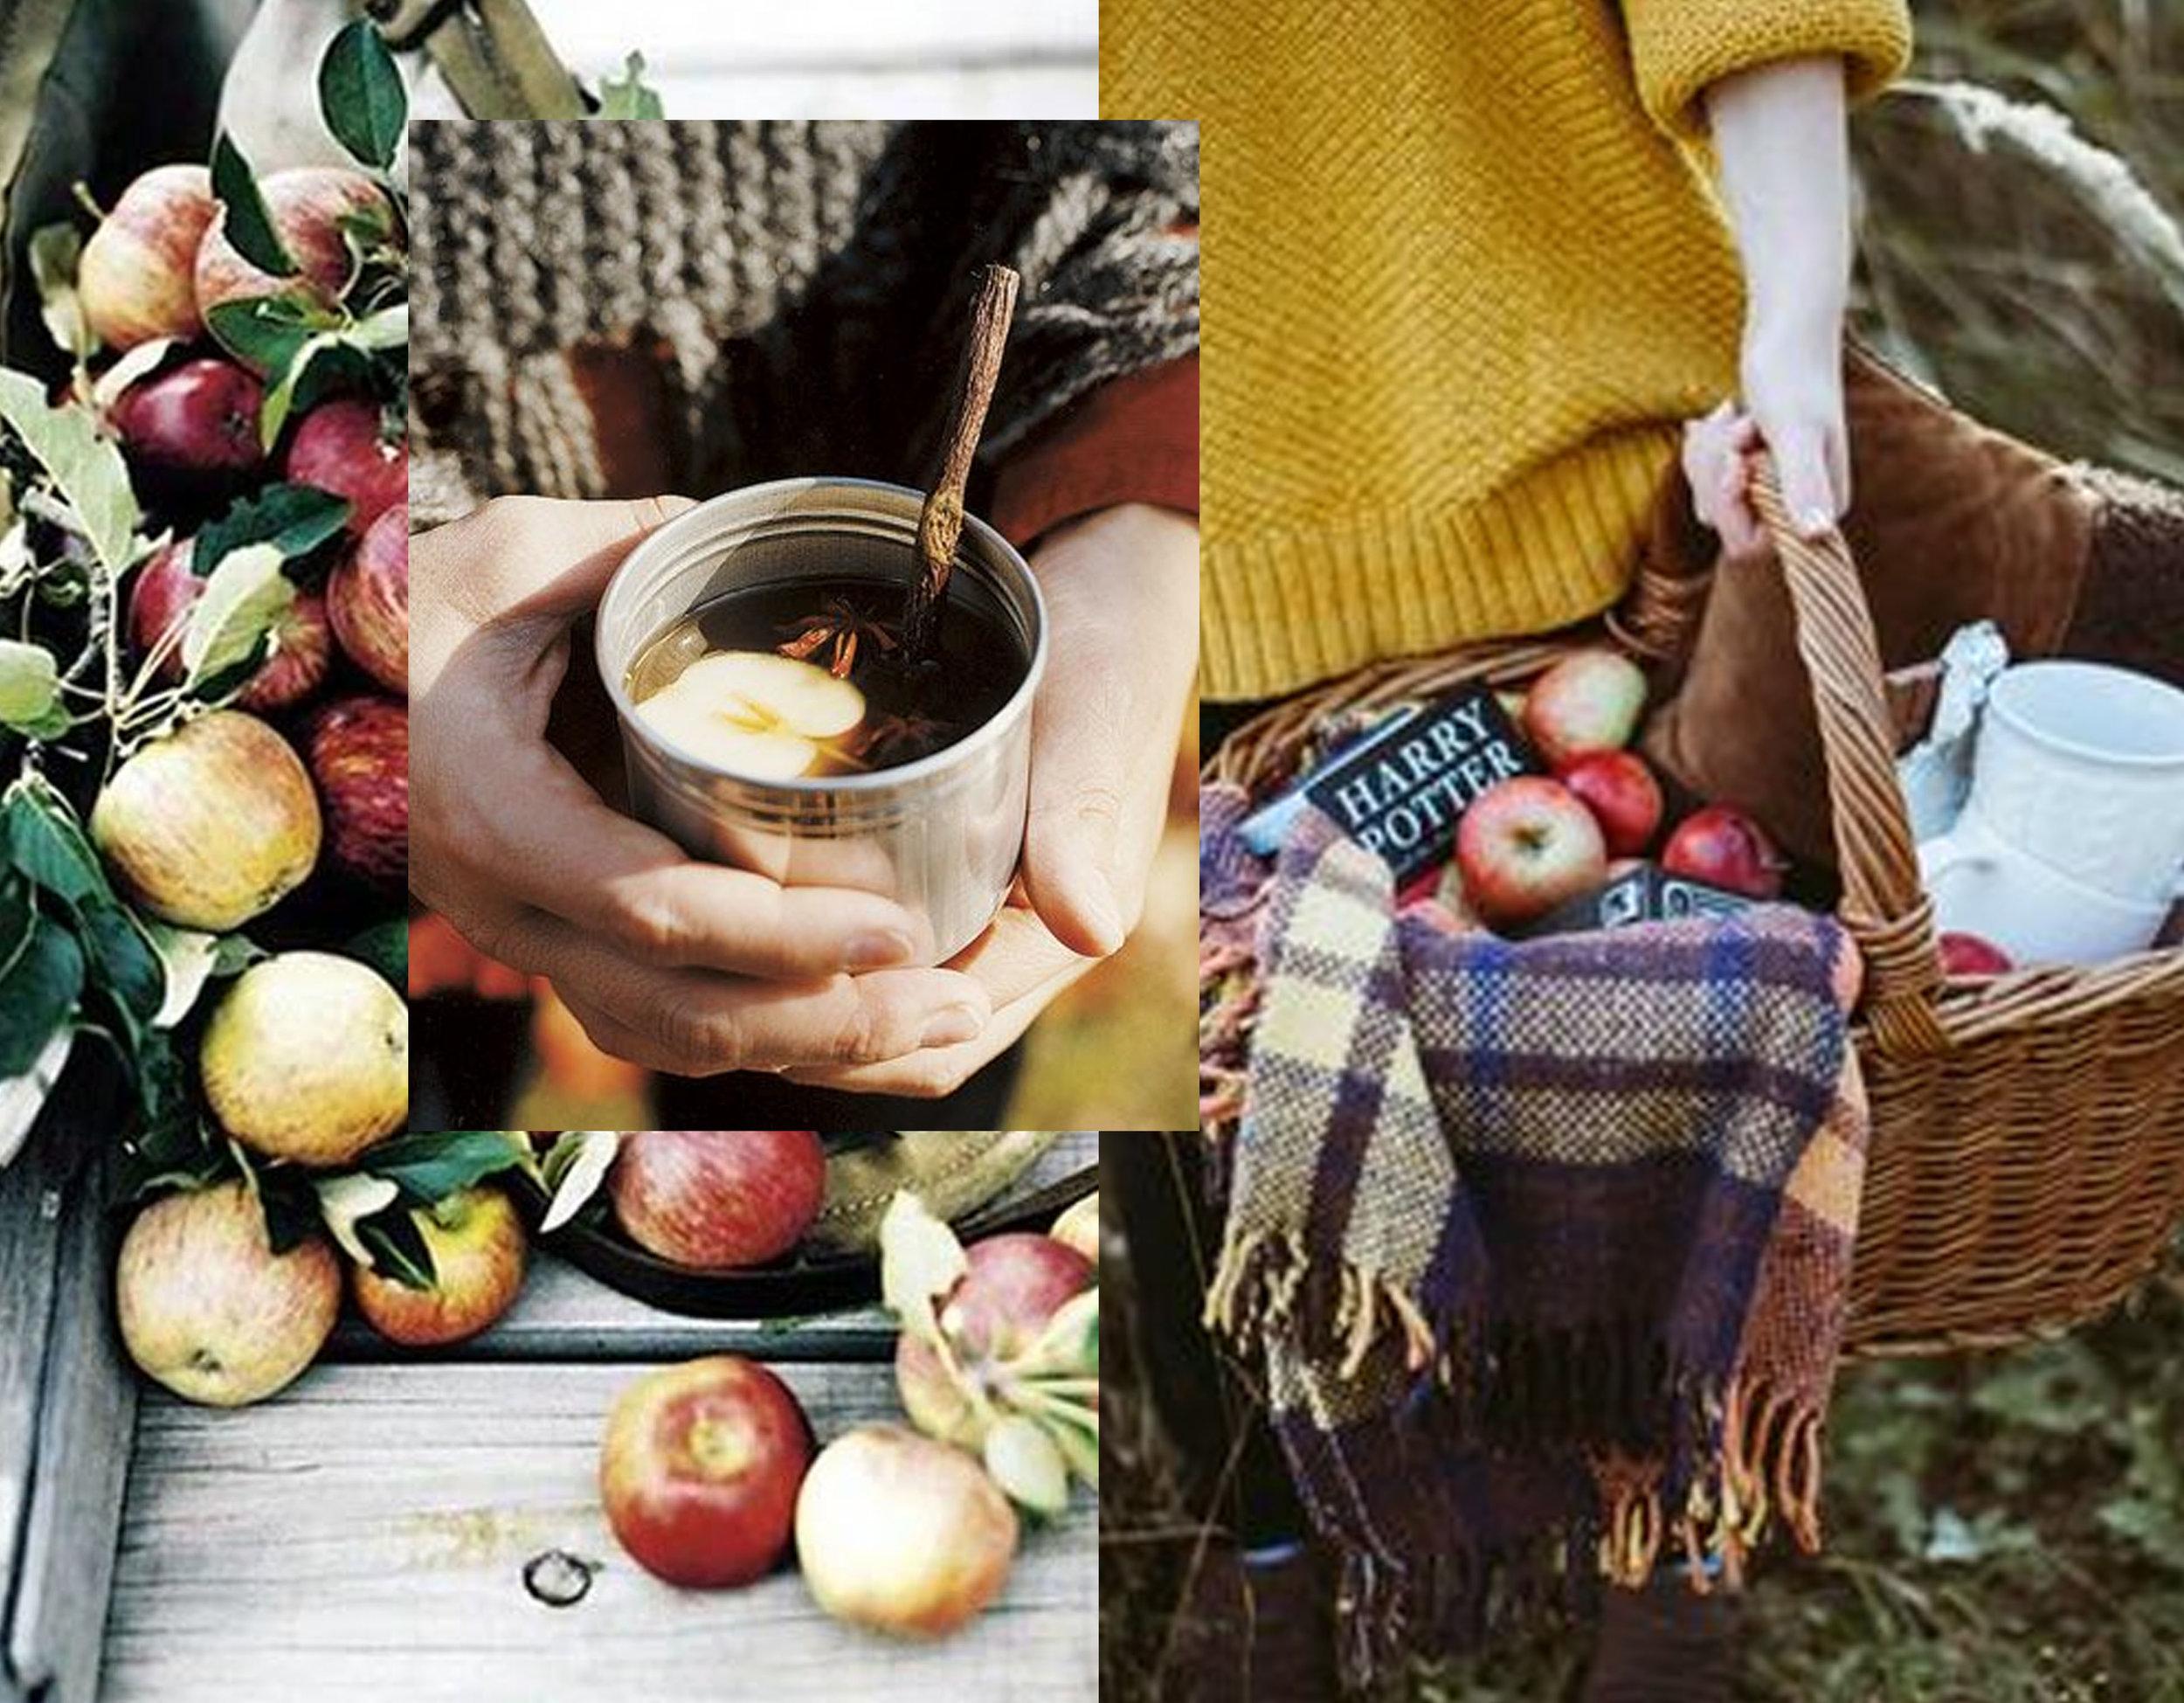 pples via  Lauren Liess  - warm cider via  Country Living  - picnic in the woods via  Pinterest